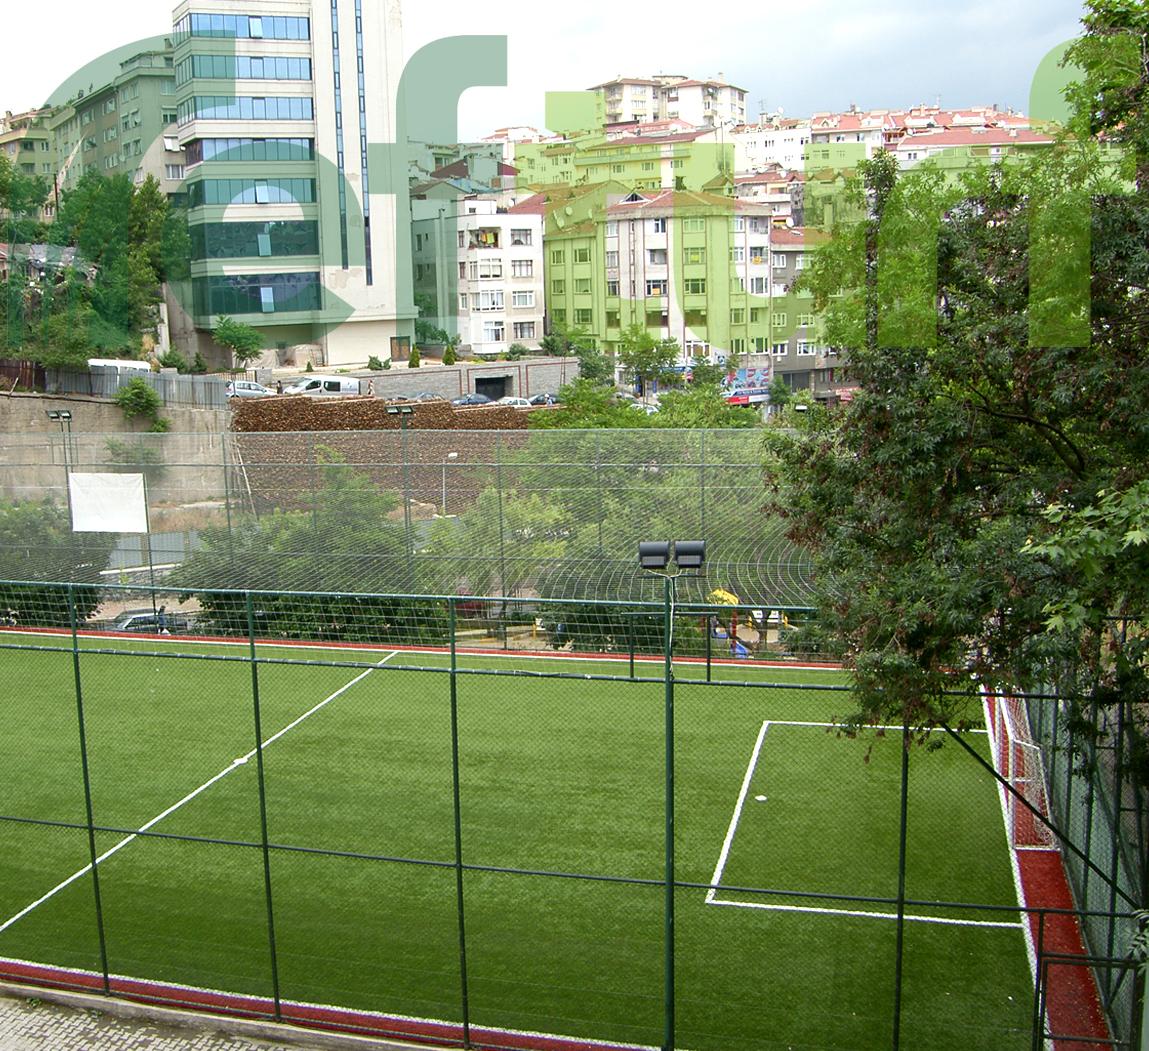 halı saha yapım maliyeti, halı saha, açık halı sahalar, turkey mini football field paid,